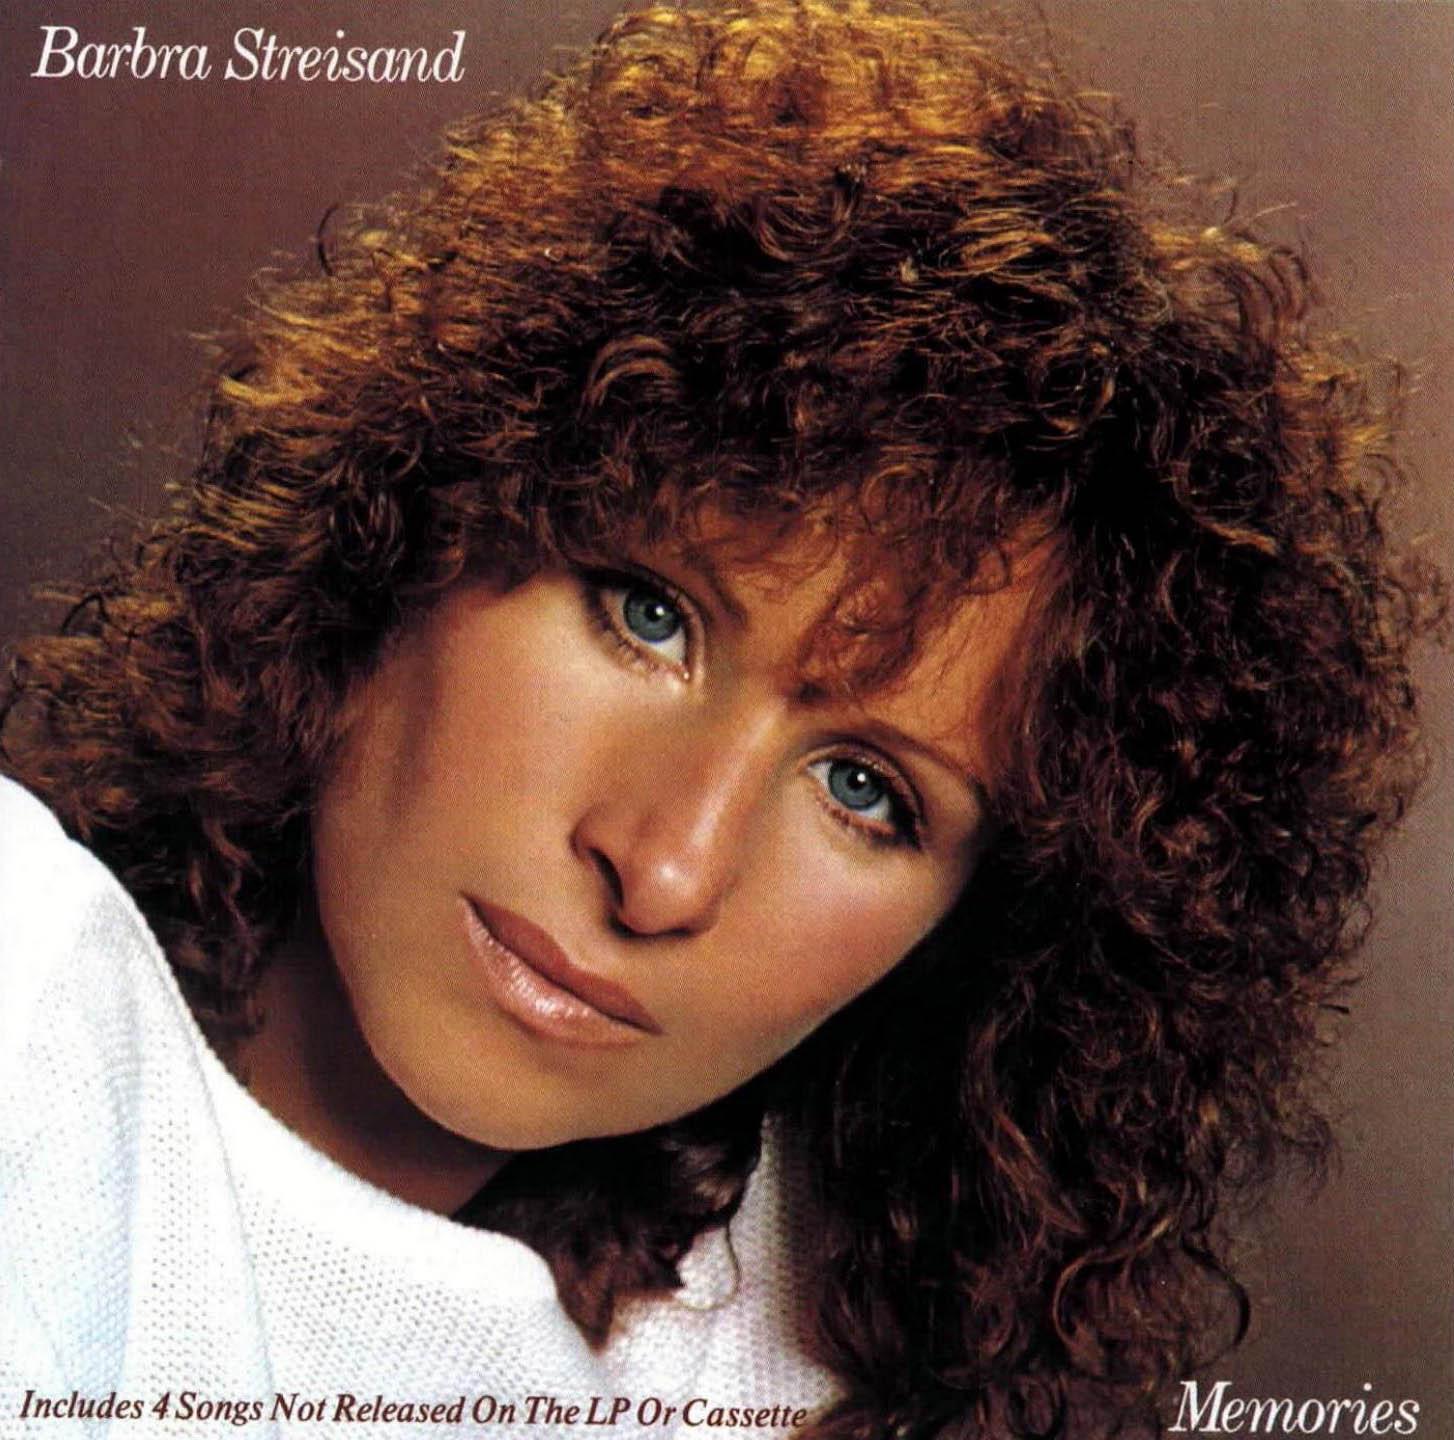 http://4.bp.blogspot.com/-SqiRP8wl9vA/TW6k9xYEFTI/AAAAAAAADVU/Cl1X2eavbIA/s1600/Barbra_Streisand-Memories-Frontal.jpg